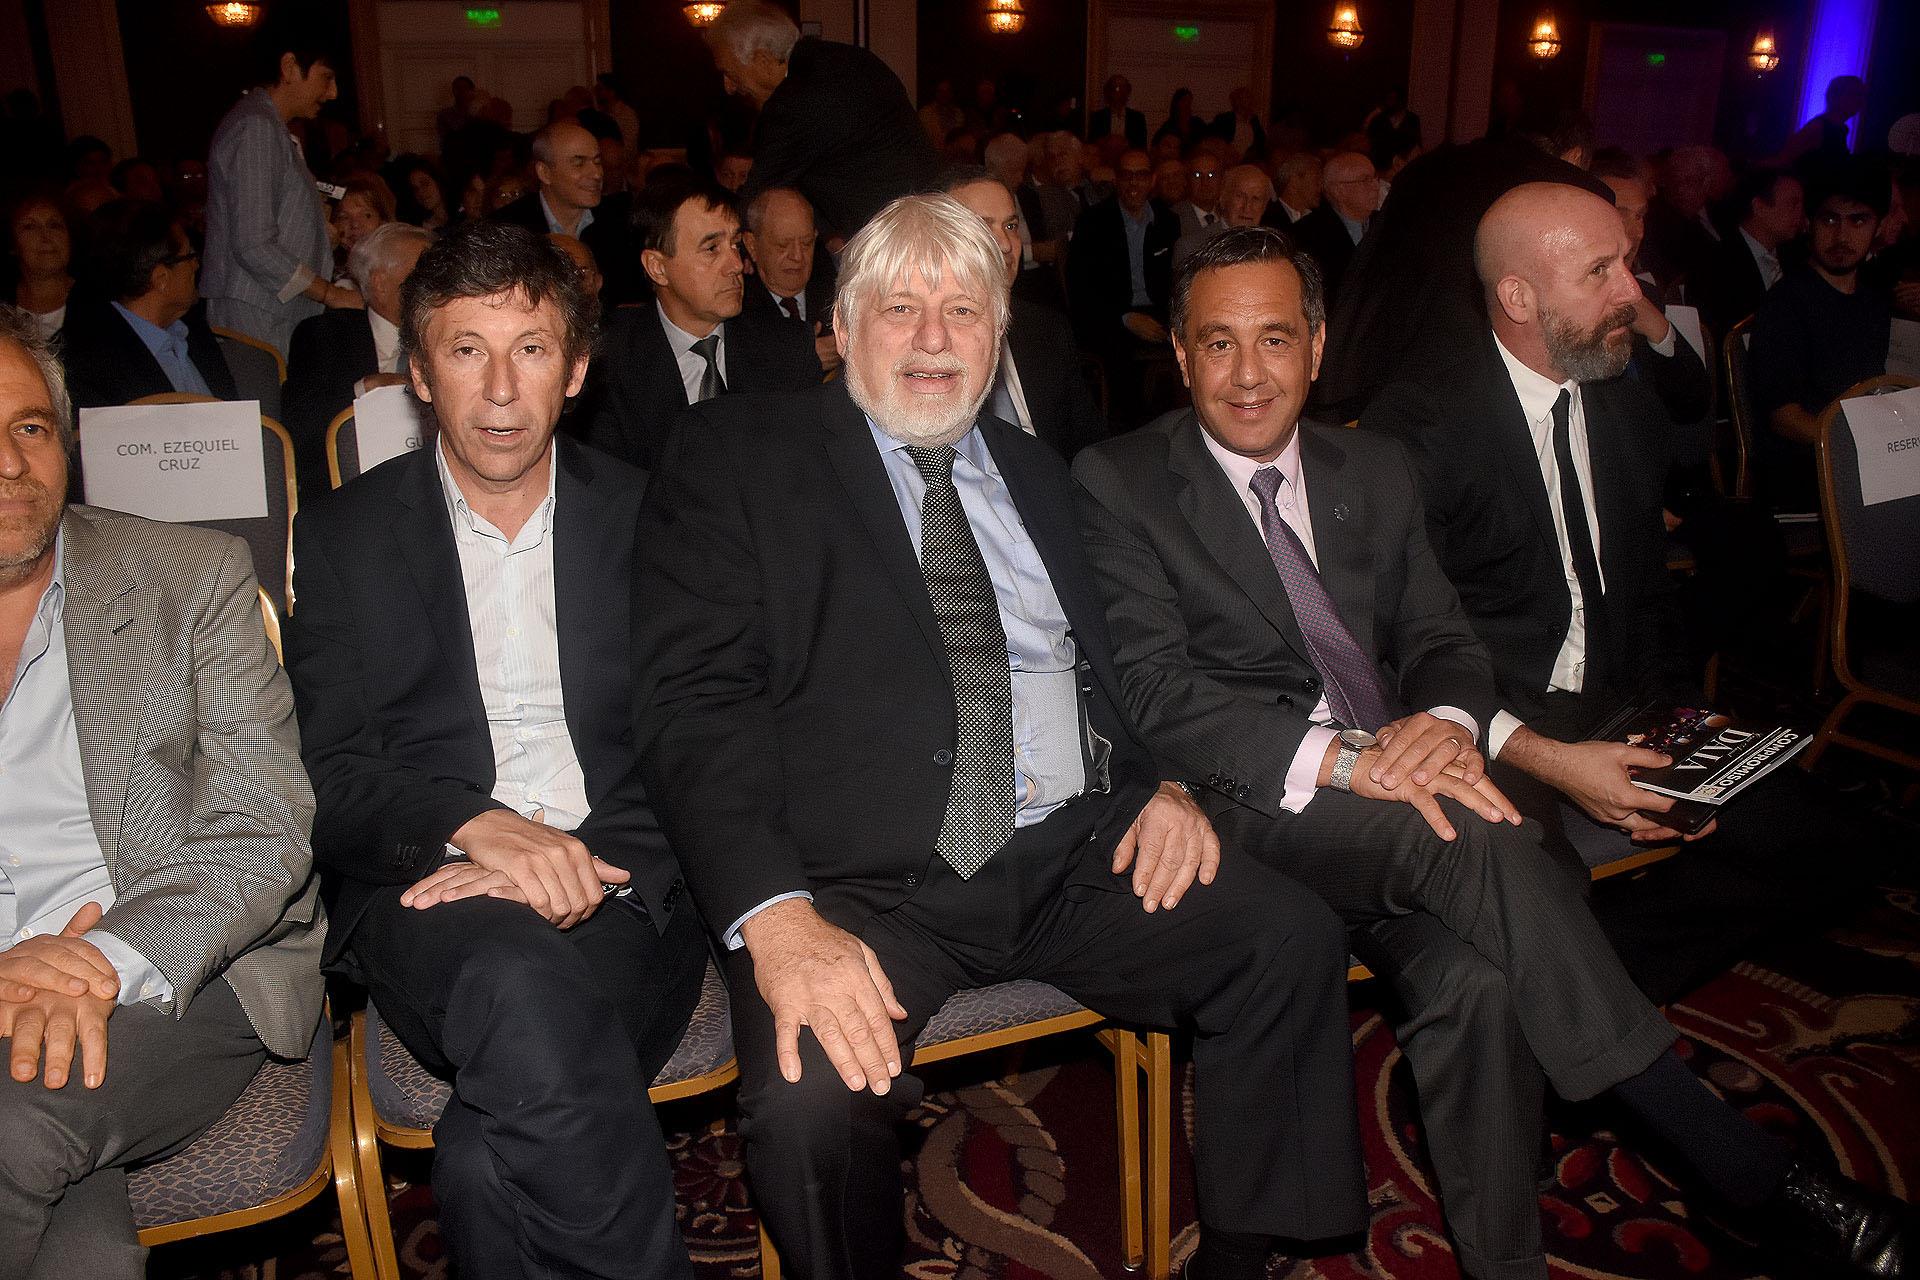 El intendente de San Isidro, Gustavo Posse, junto a Adrián Werthein, Alejandro Finocchiaro y el diputado Waldo Wolff